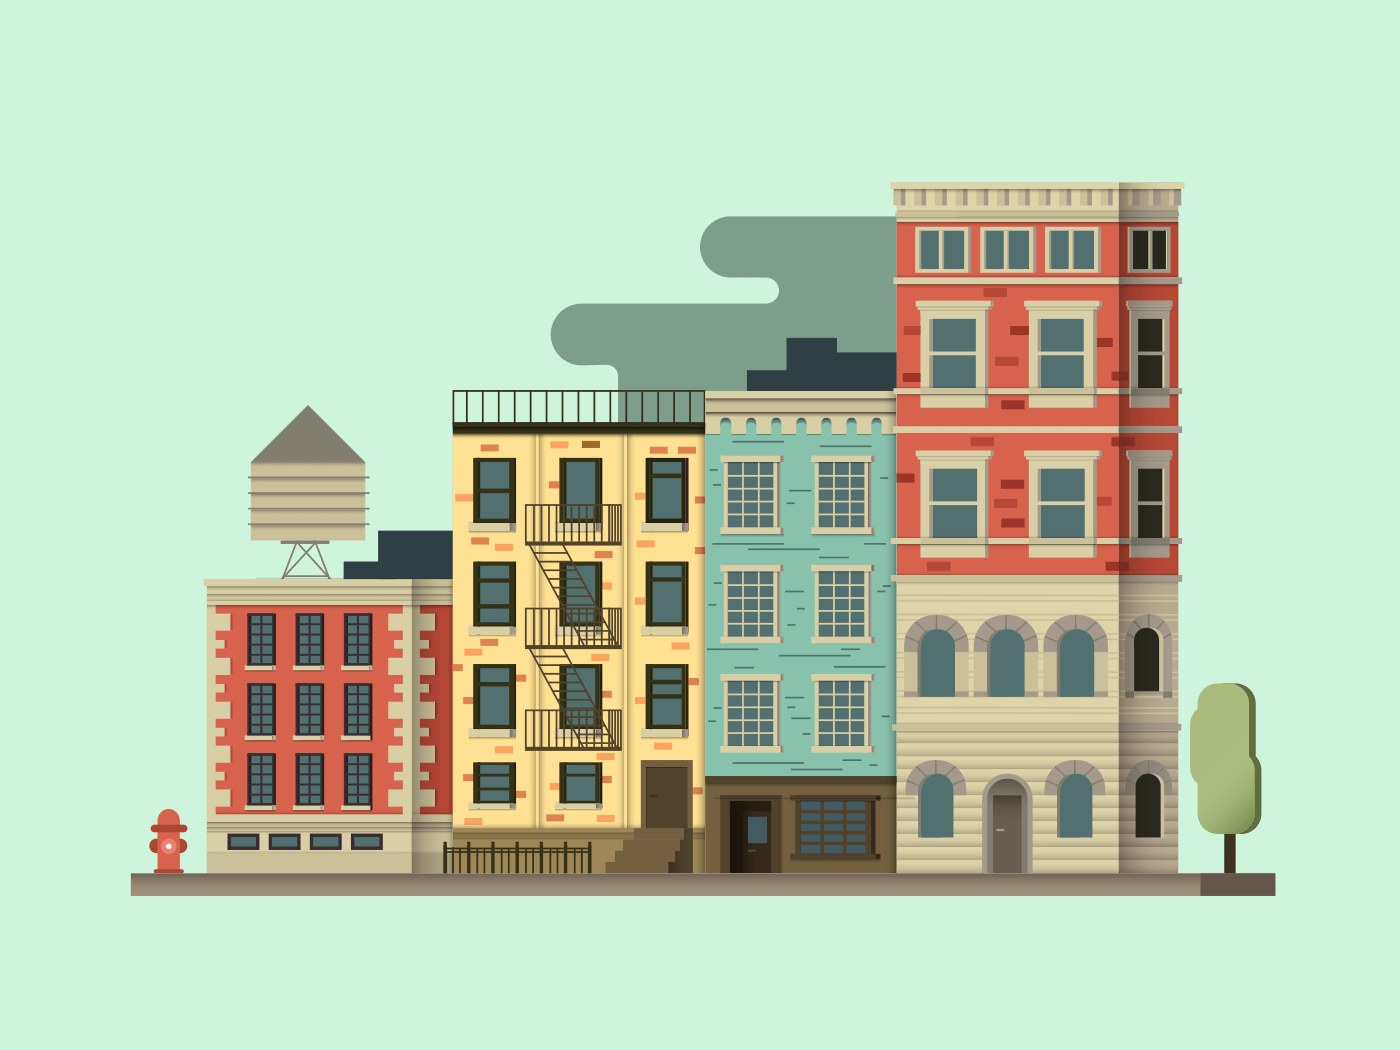 New york city building illustration